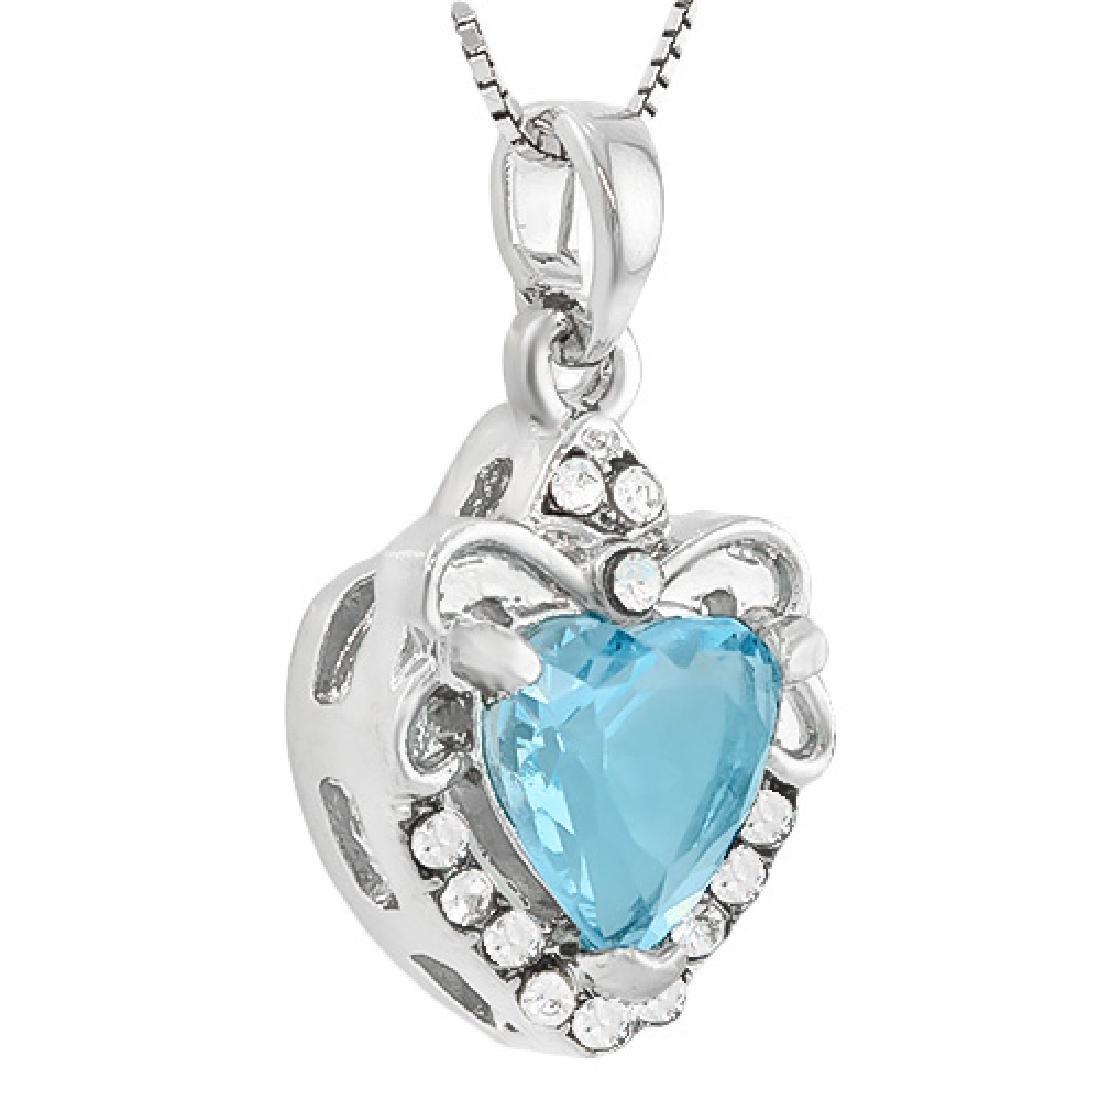 CREATED BABY SWISS BLUE TOPAZ & FLAWLESS CREATED DIAMON